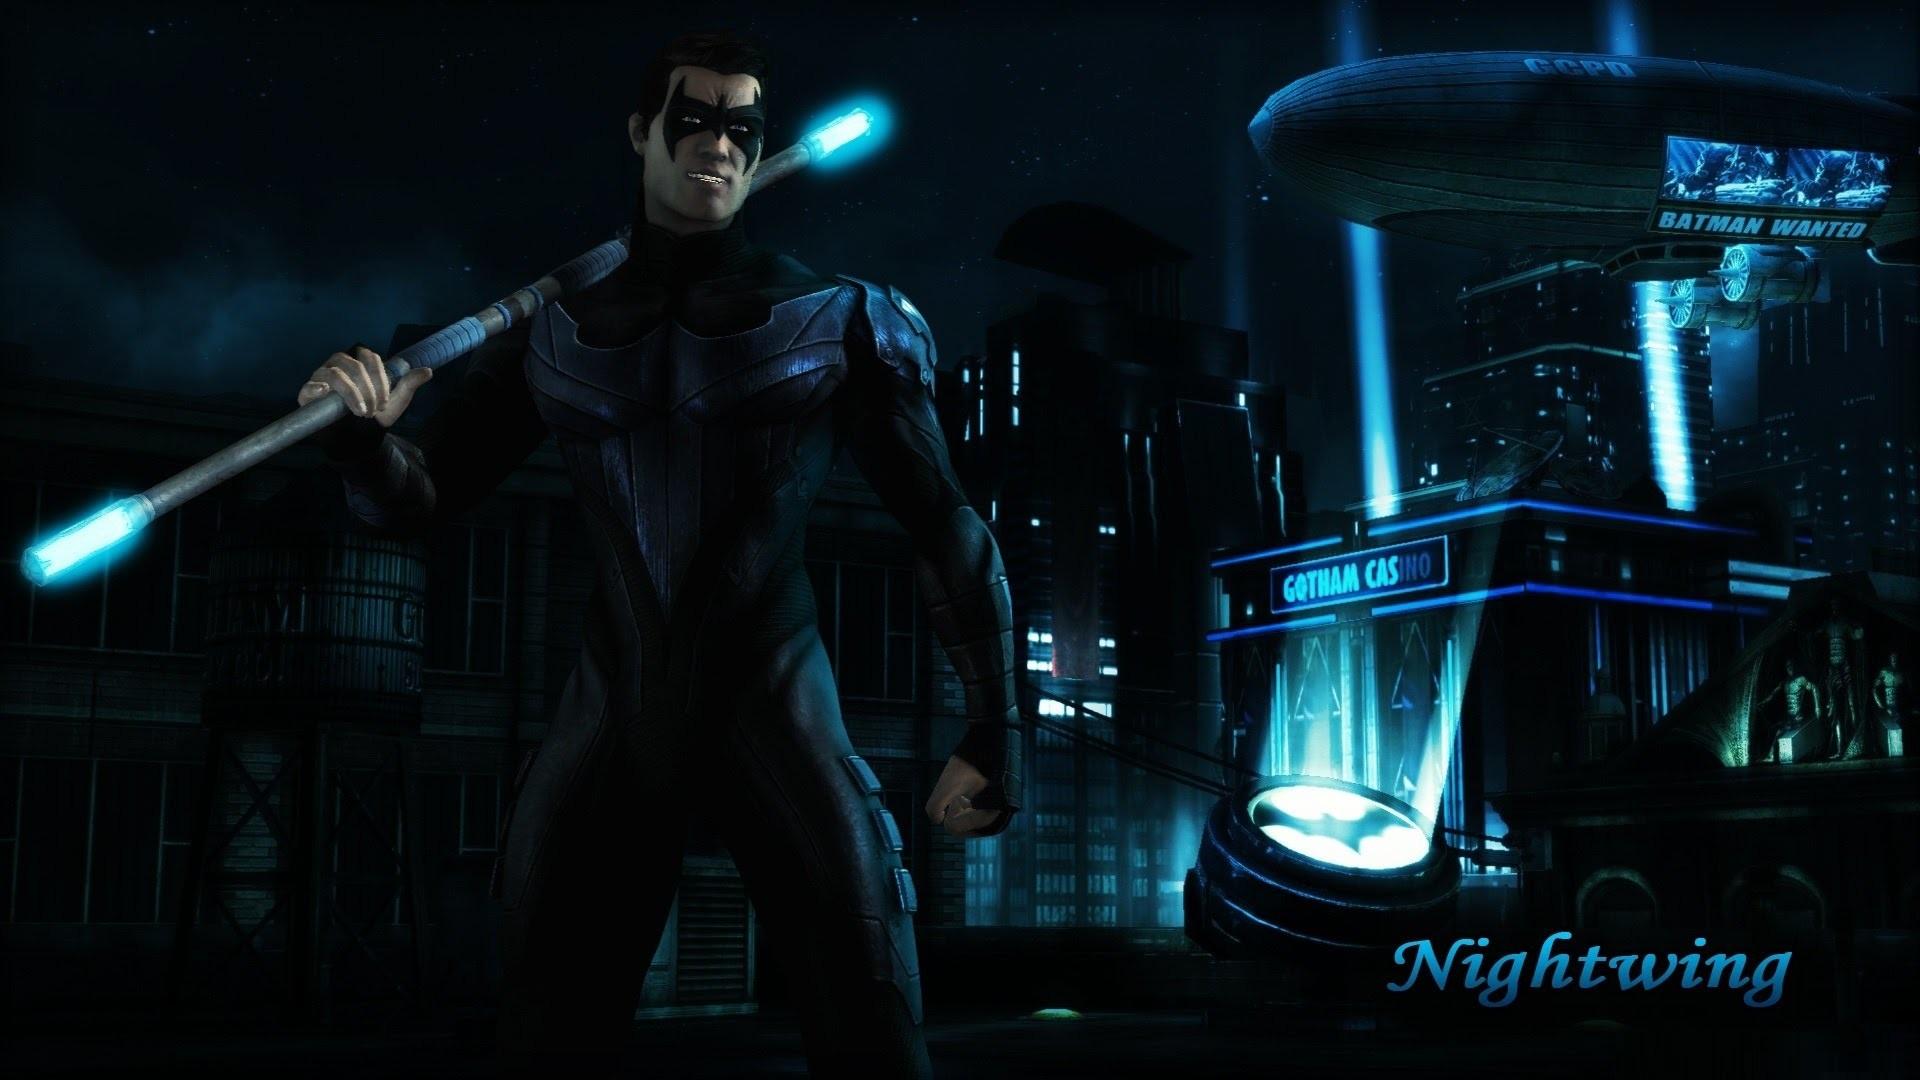 How Batman Mourned Nightwing | Comicnewbies